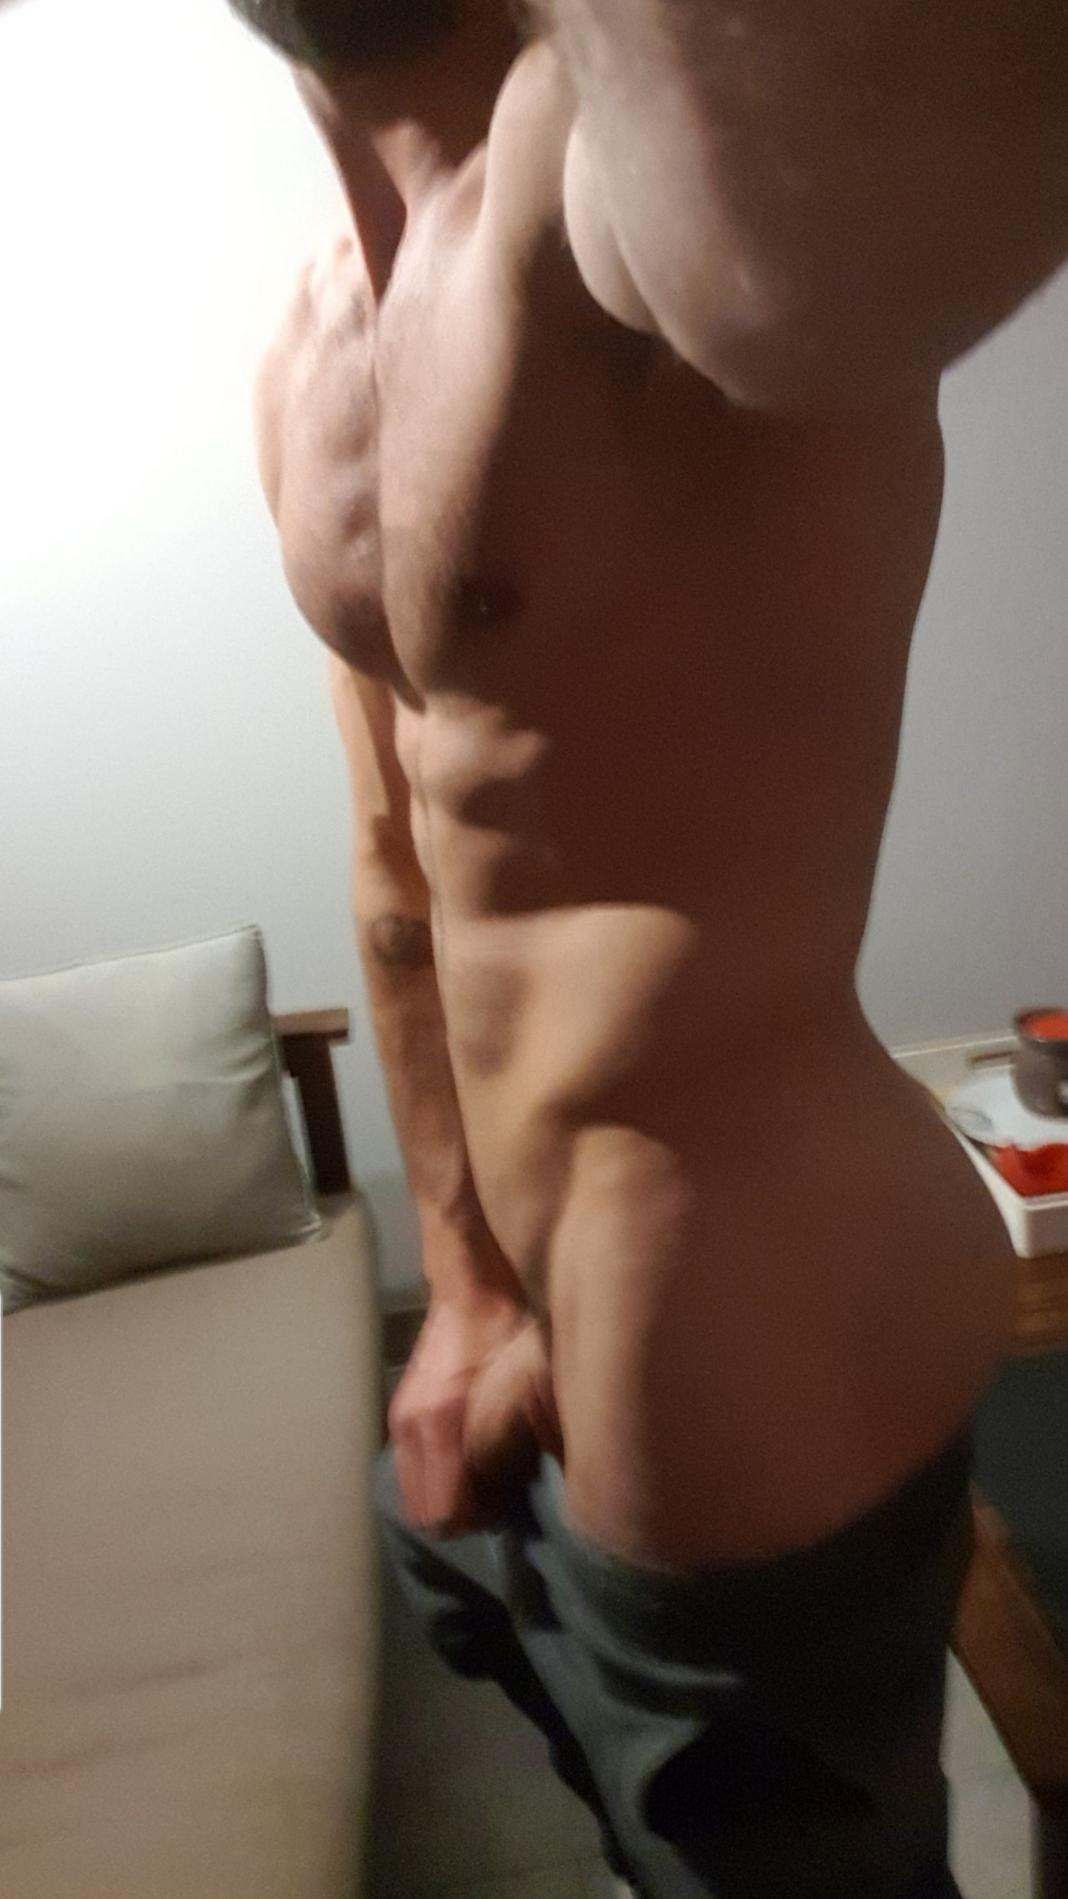 Jeunemale5 sexy?s=rwhmavrpuyjo4hcj3jdsjb6aaqhh+00egde5vbmtllo=